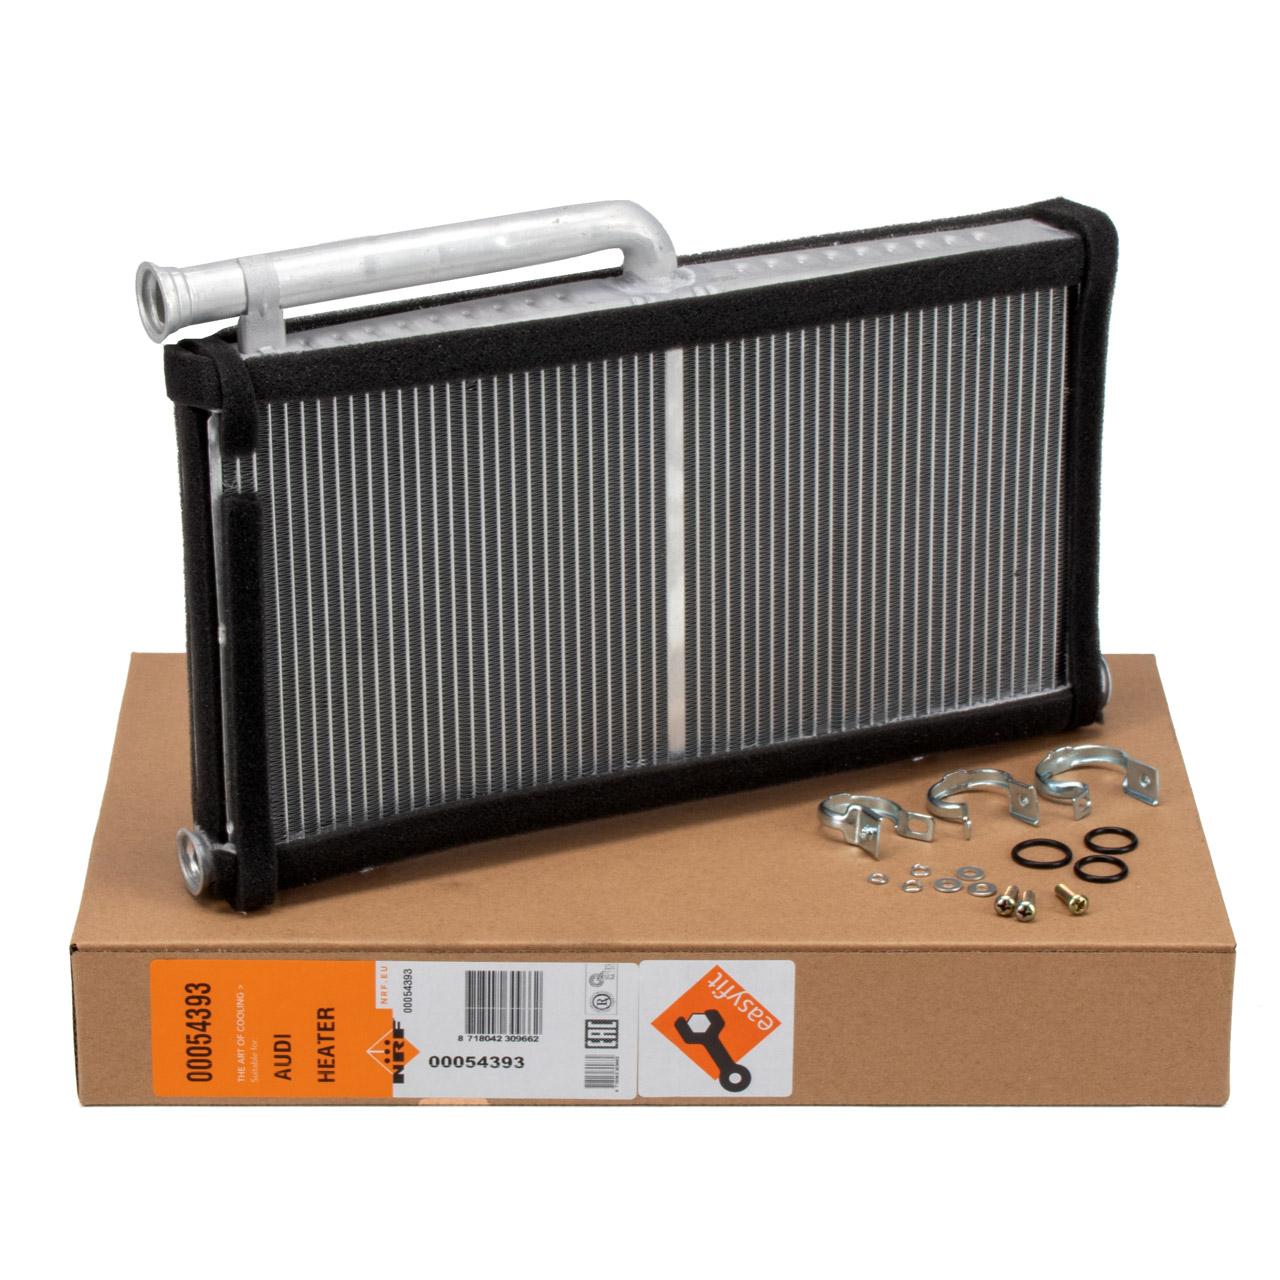 NRF 54393 Wärmetauscher Heizung EASY FIT AUDI A6 C6 ohne elektr. Zusatzheizung 4F0820031A